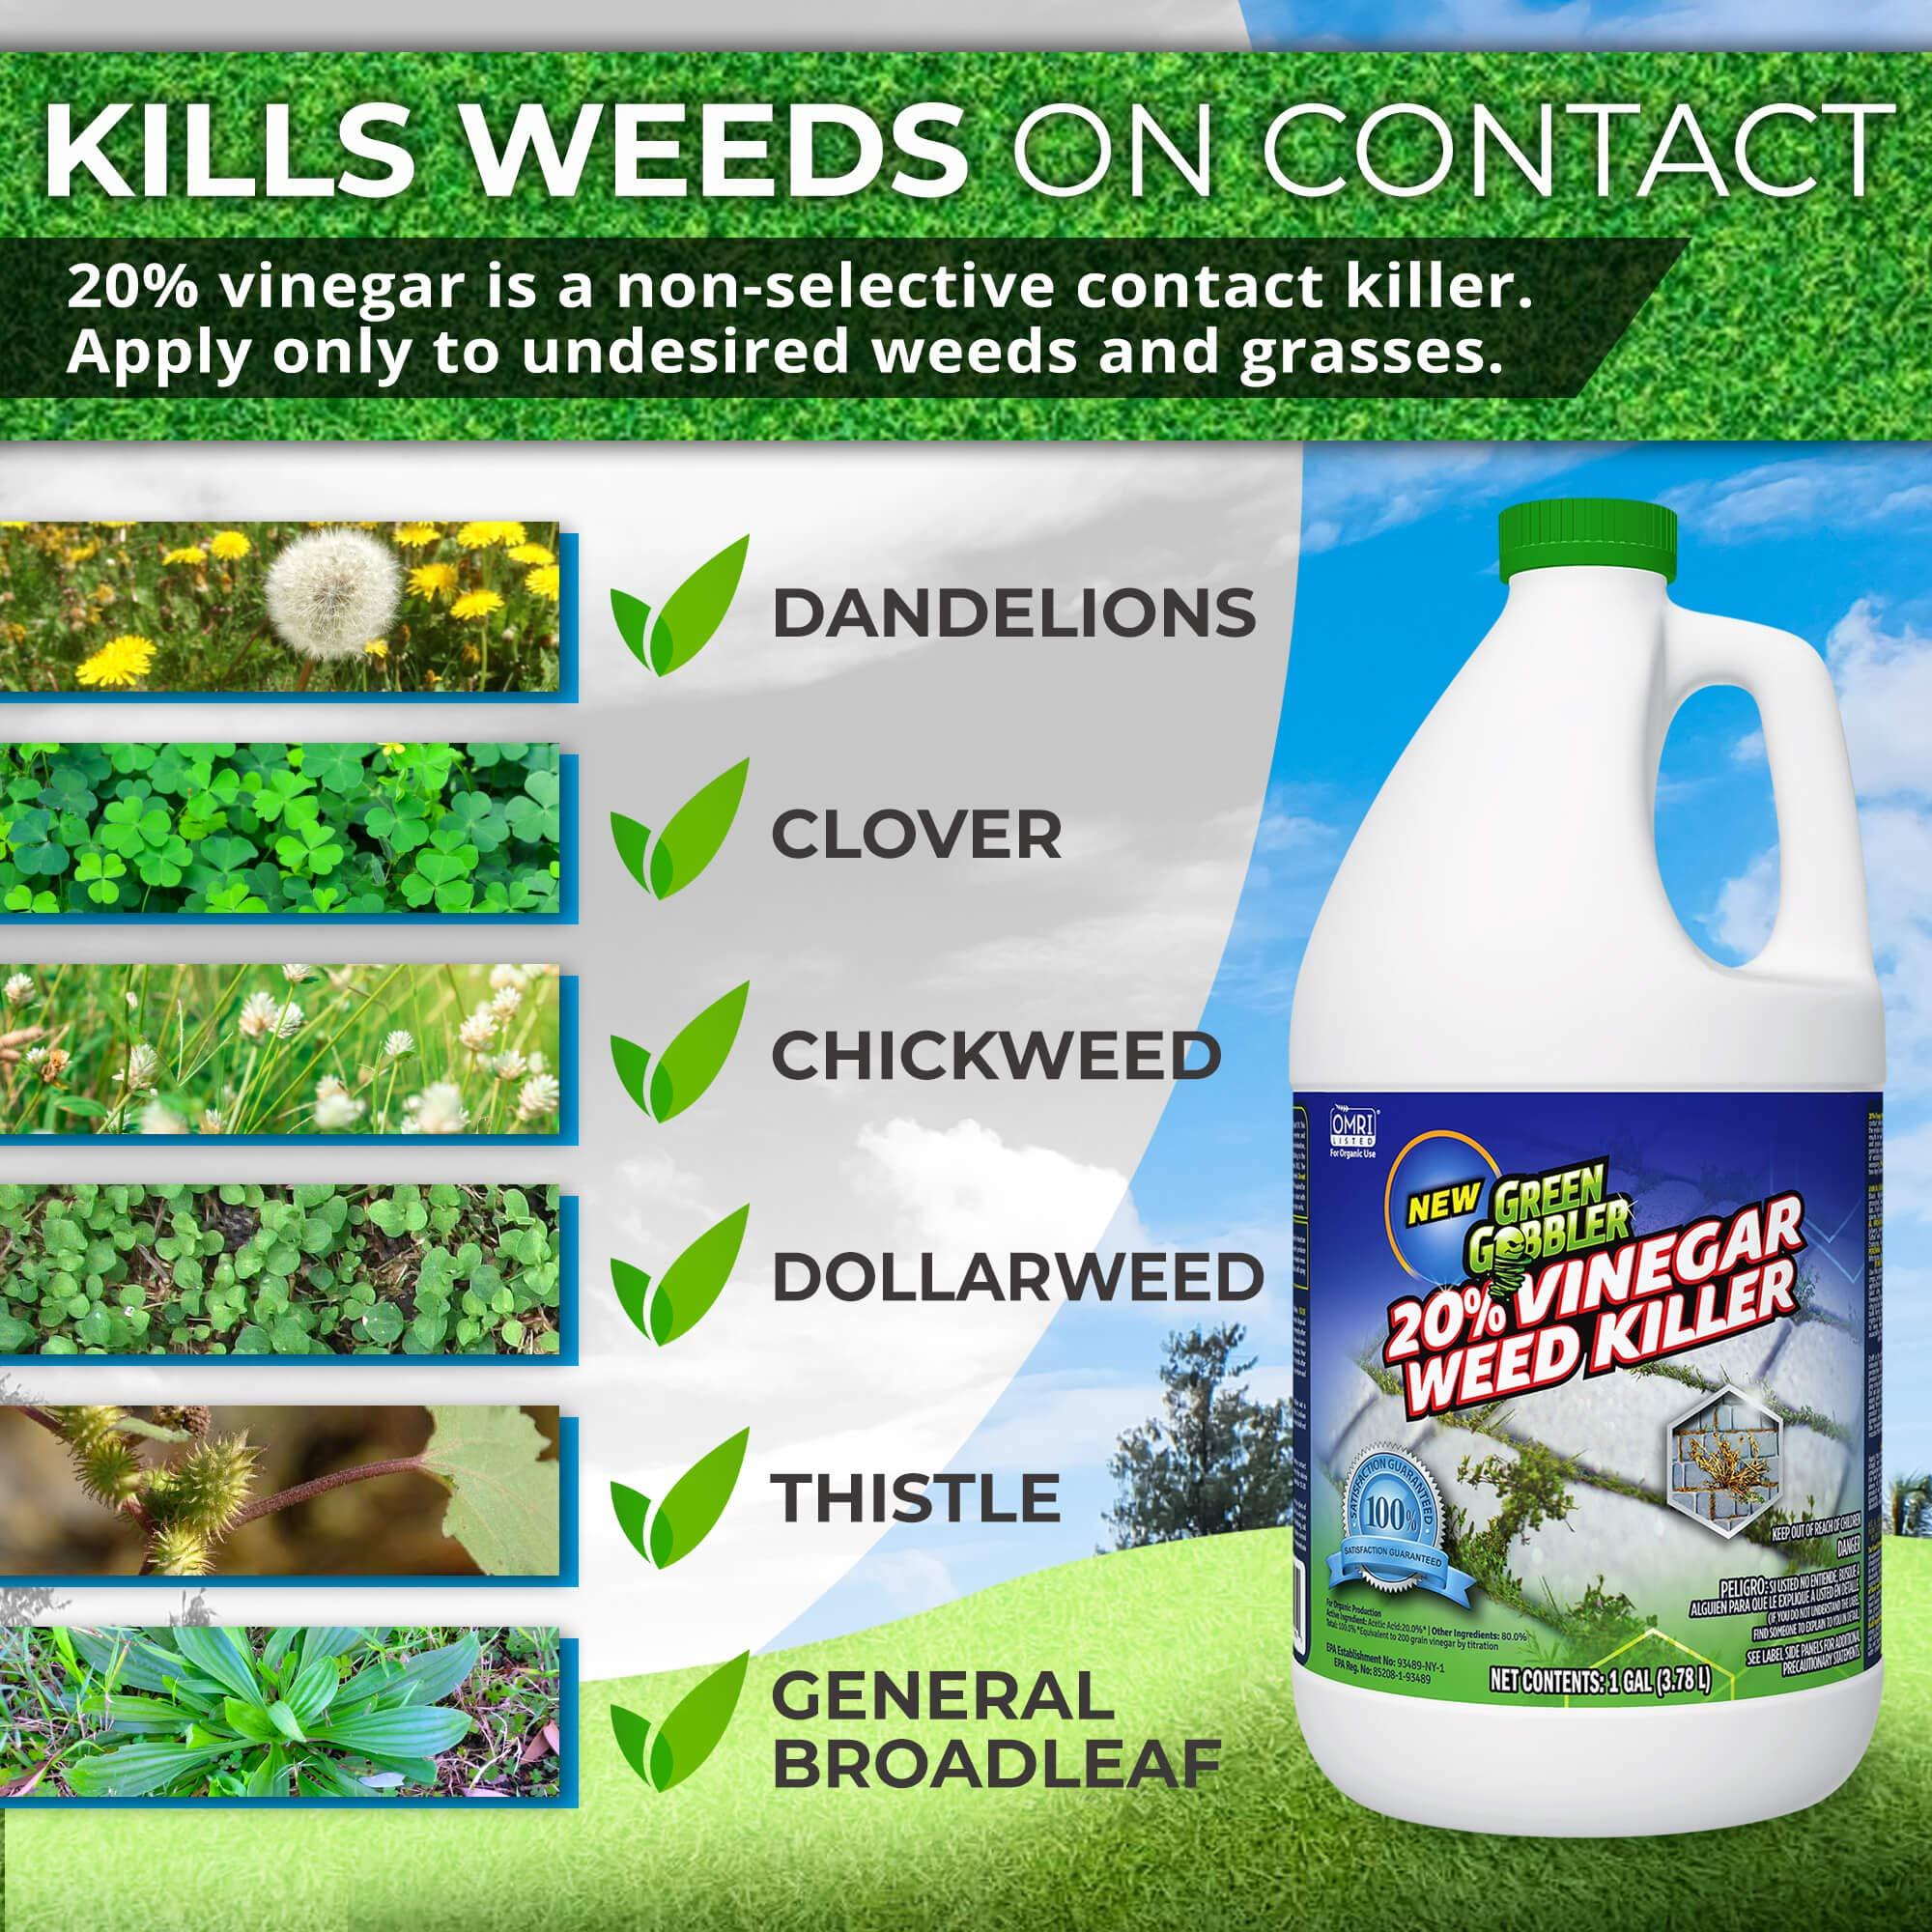 Green Gobbler 20% Horticultural Vinegar Weed Killer   Herbicide   Natural Weed Killer   Organic Weed Killer (5 Gallon Pail) by Green Gobbler (Image #3)